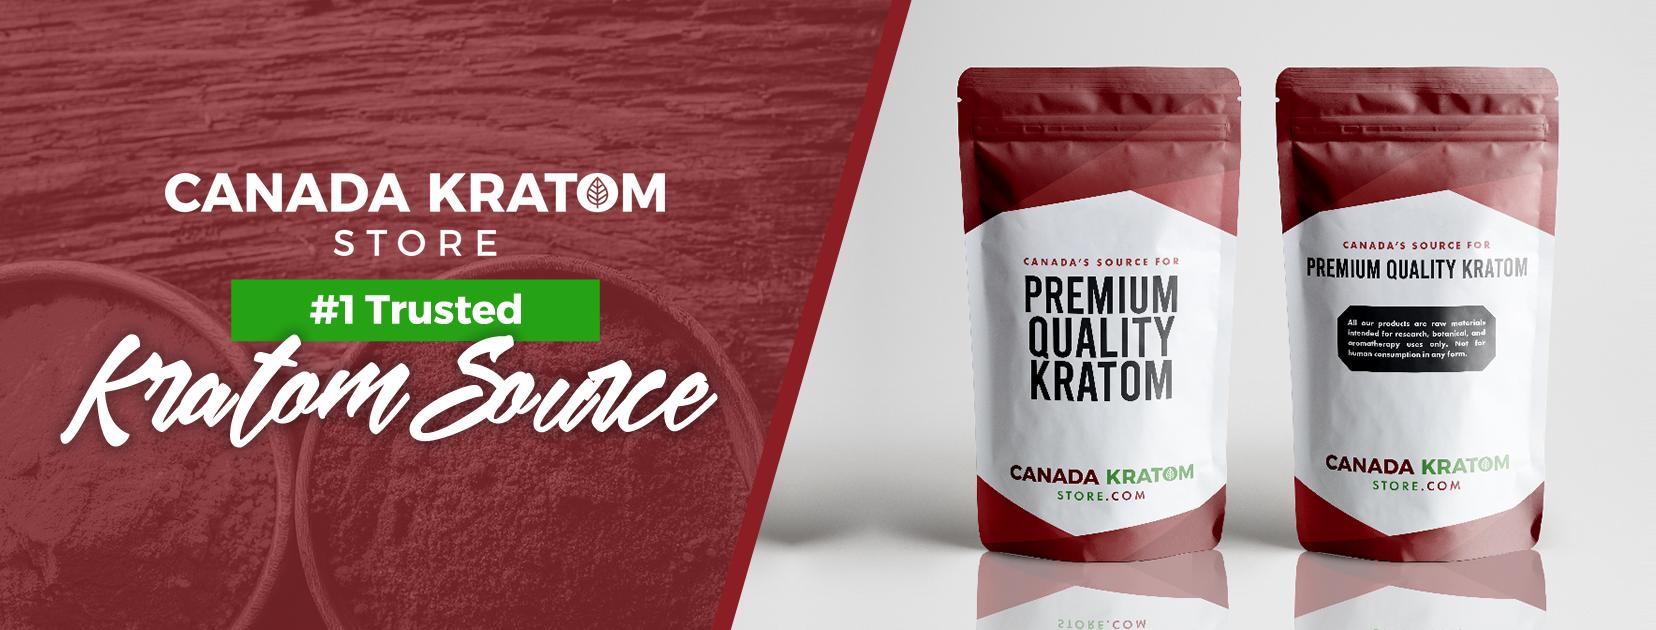 Canada Kratom Store #1 Trusted Kratom Source